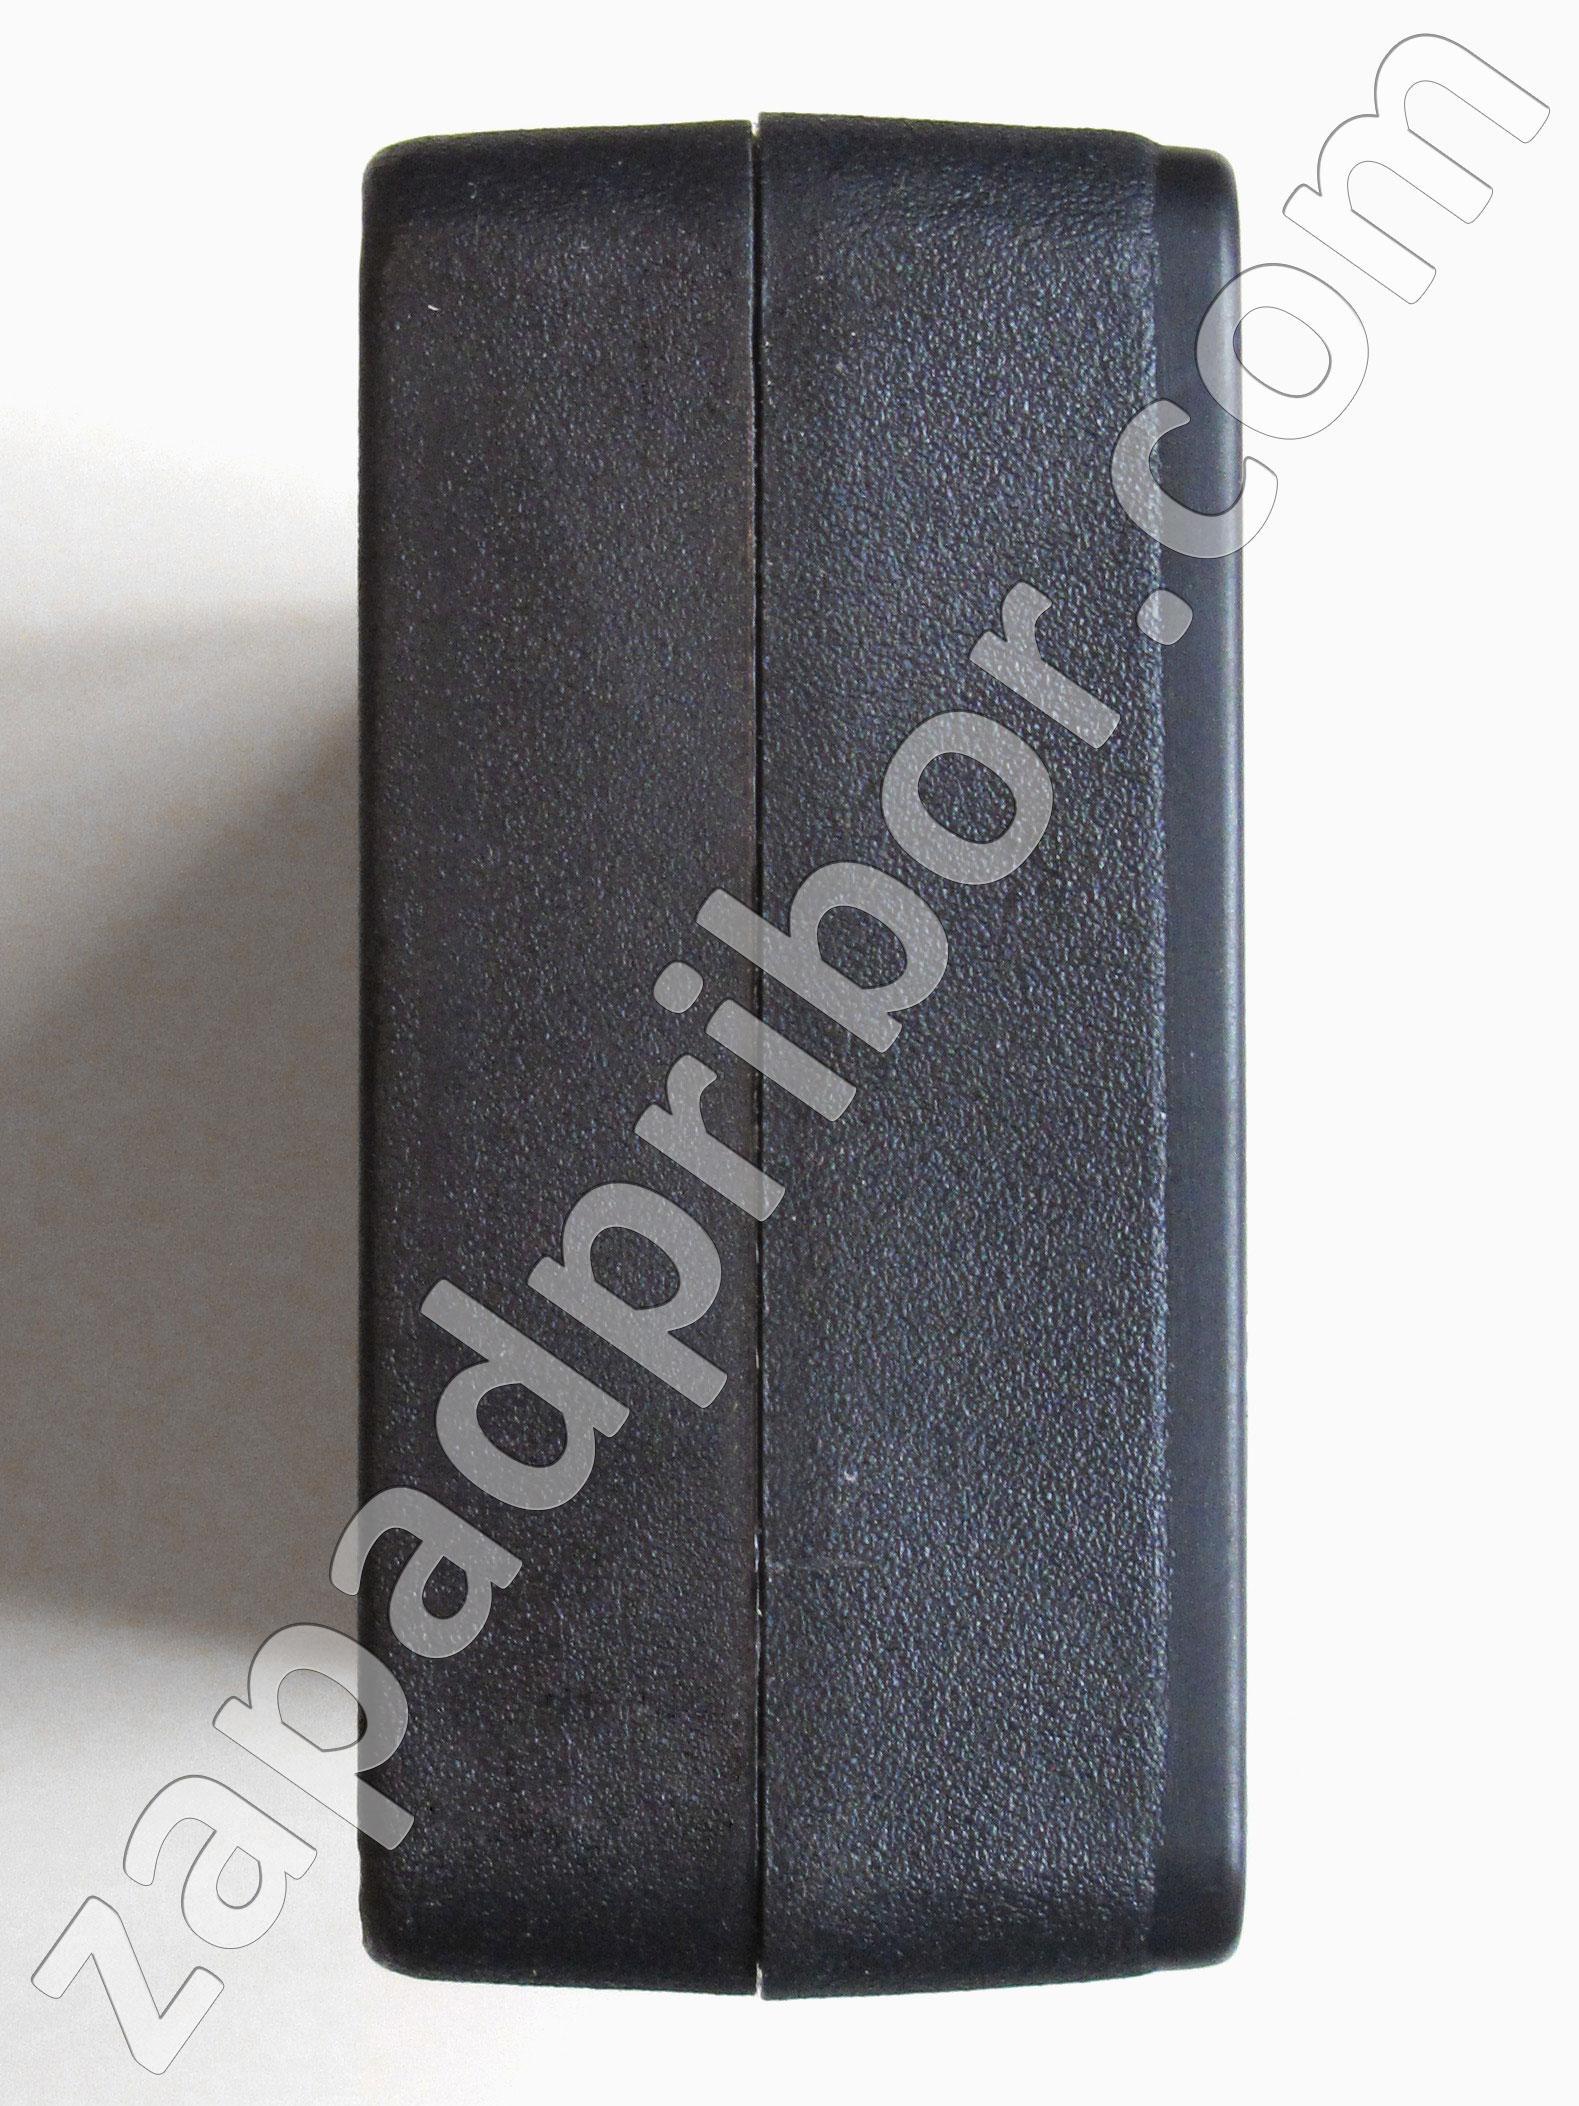 SINTEKS-DBG-01S dosimeter    9999RUB, 4199UAH, 10pcs. in stock. 4ba893baba9